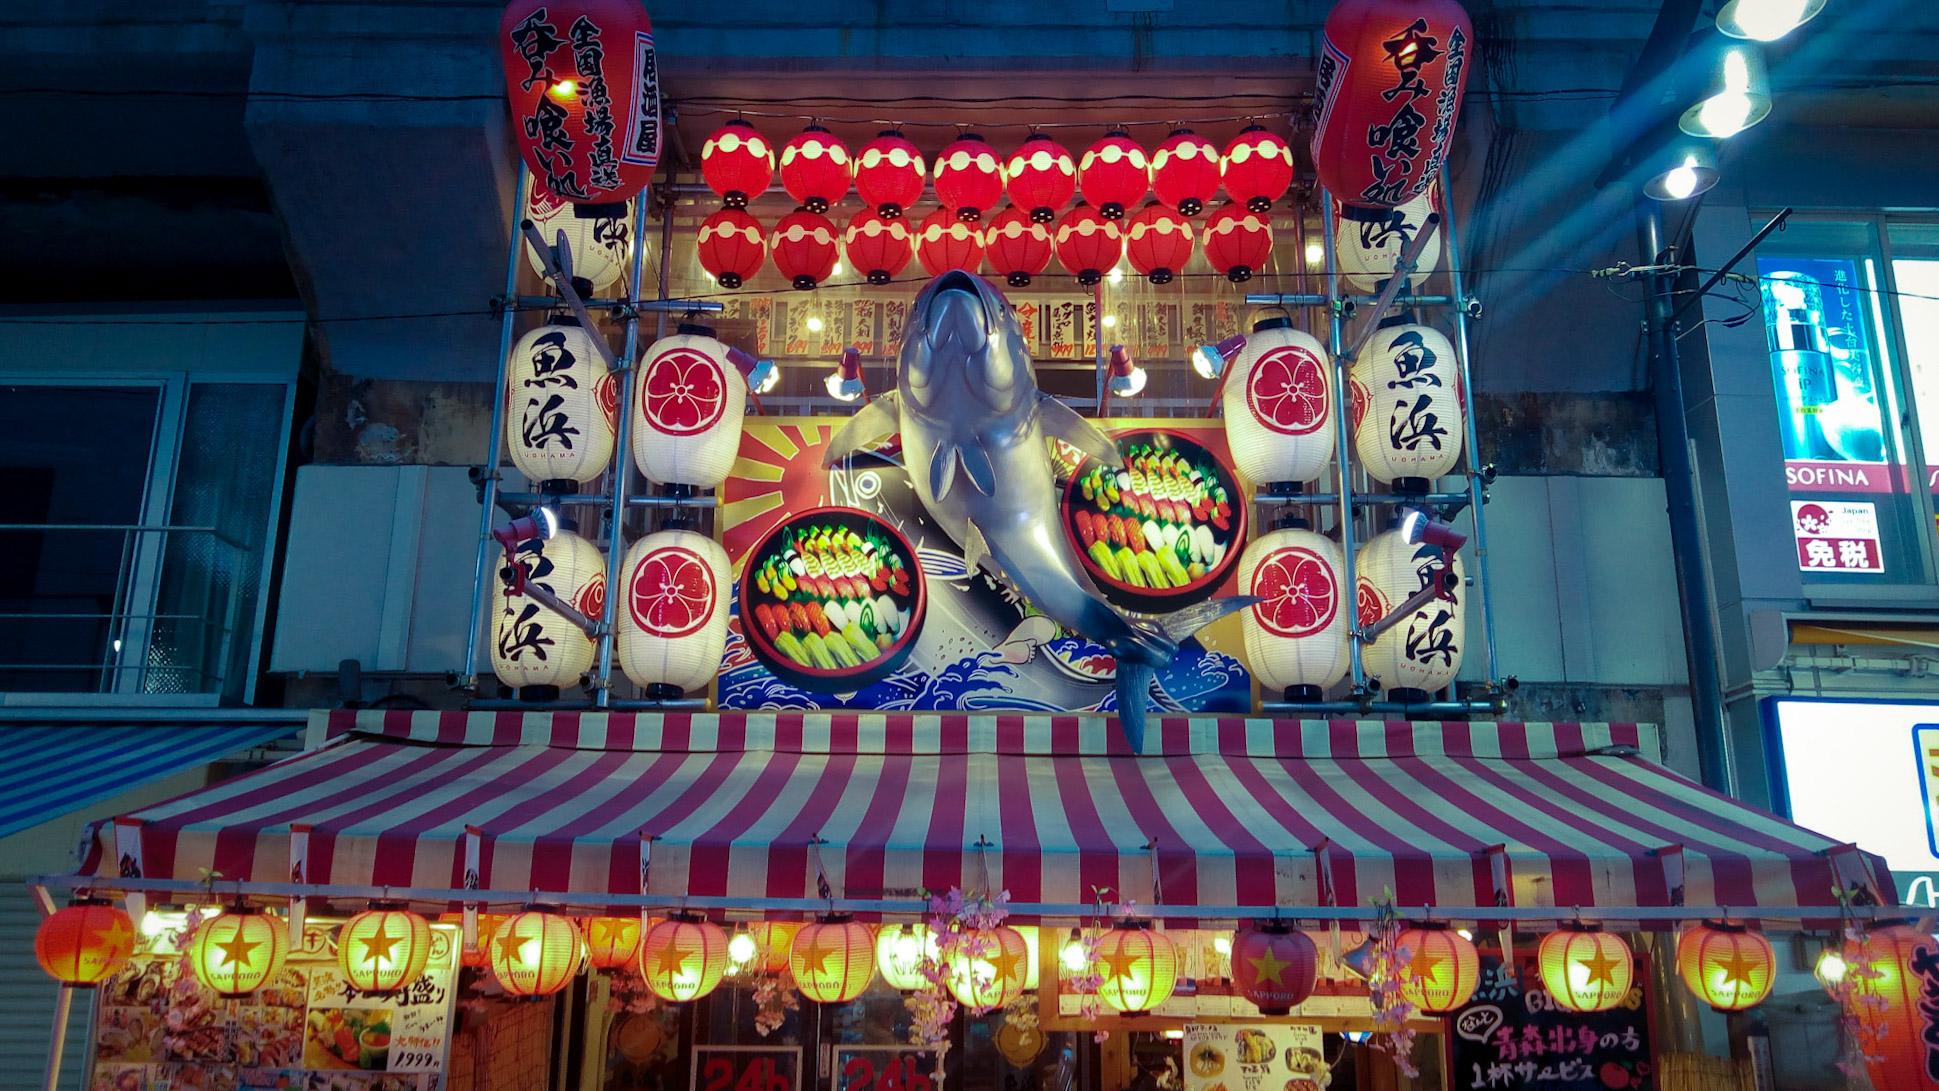 Urban Photos – Taito, Tokyo, Japan. 'Ameya-Yokocho.' Complete image from my latest travel art blog article 'Sakura Japan.' Now online - sketchbookexplorer.com @davidasutton @sketchbookexplorer Facebook.com/davidanthonysutton #photography #japan #tokyo #sakura #ameyayokocho #sushi #travel #travelblog #cherryblossom #cherryblossomseason #cherryblossomjapan